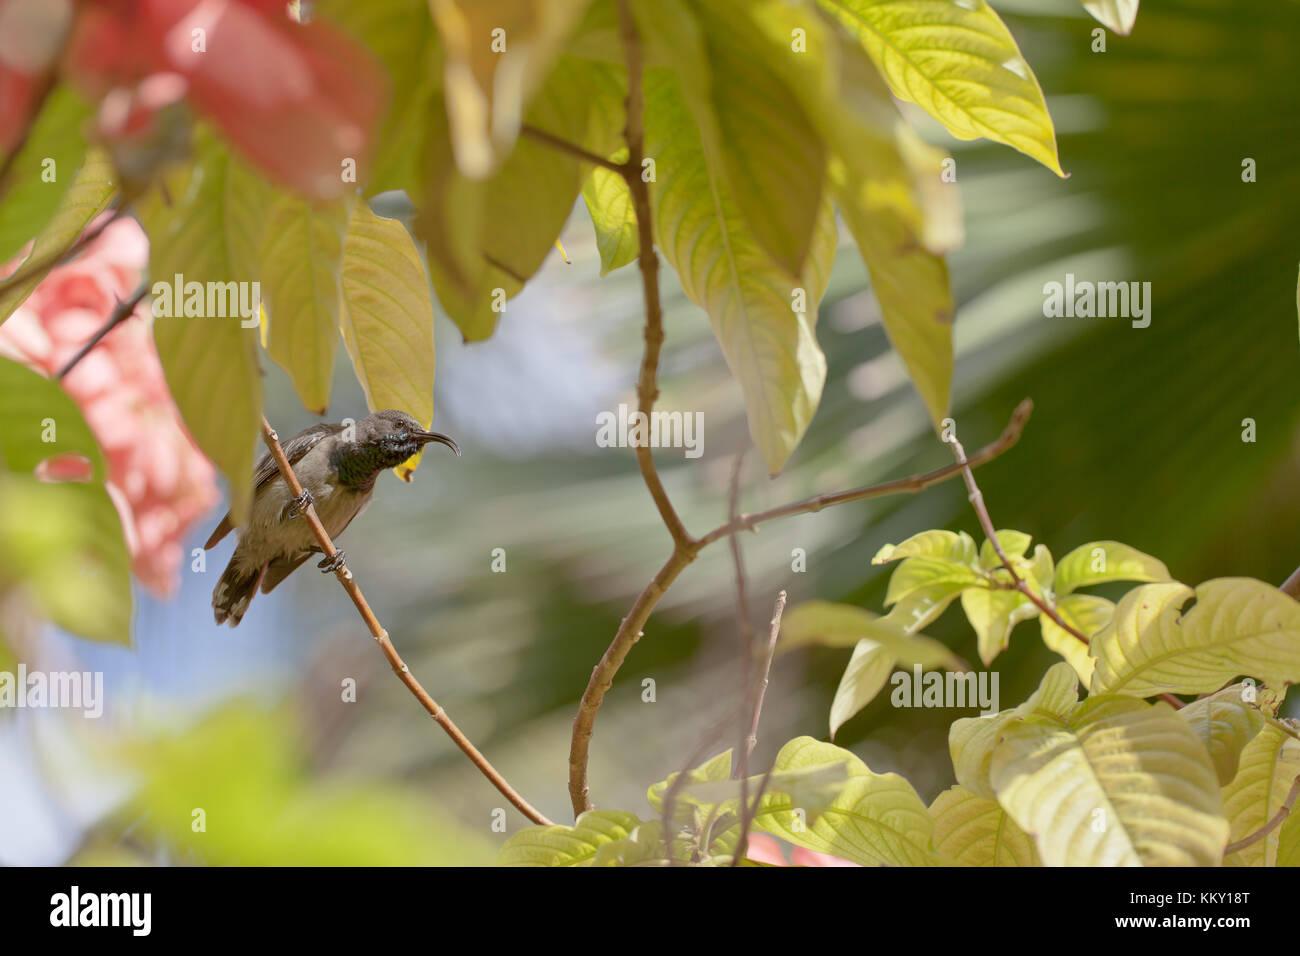 Hummingbird - Seychelles - Africa - Stock Image